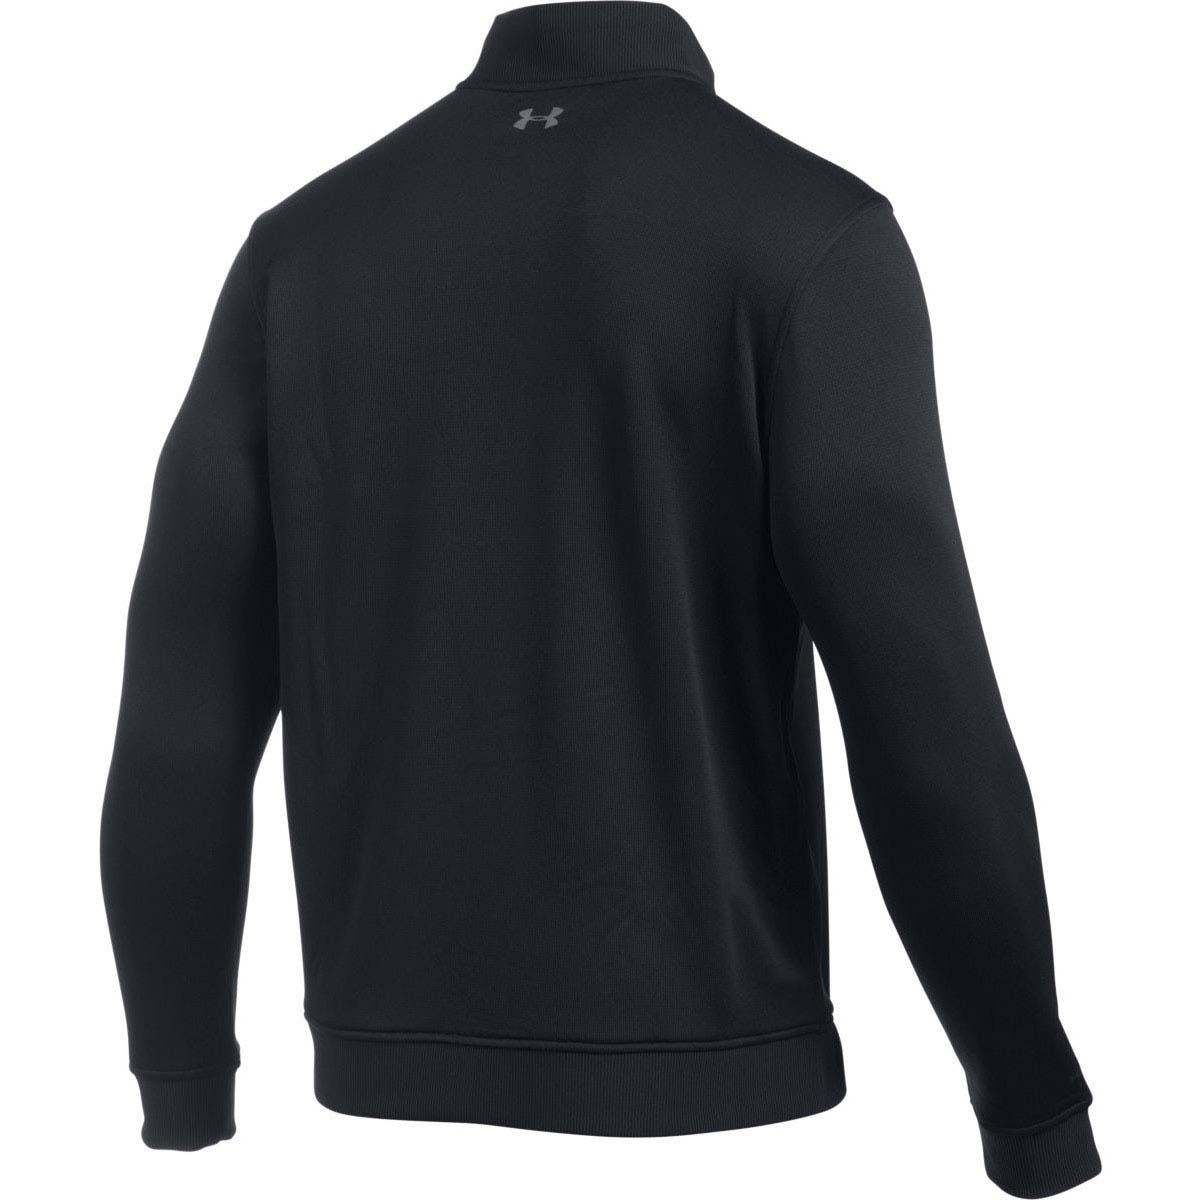 Under-Armour-Mens-UA-Storm-Sweater-Fleece-1-4-Zip-Pullover-Jumper-25-OFF-RRP thumbnail 8